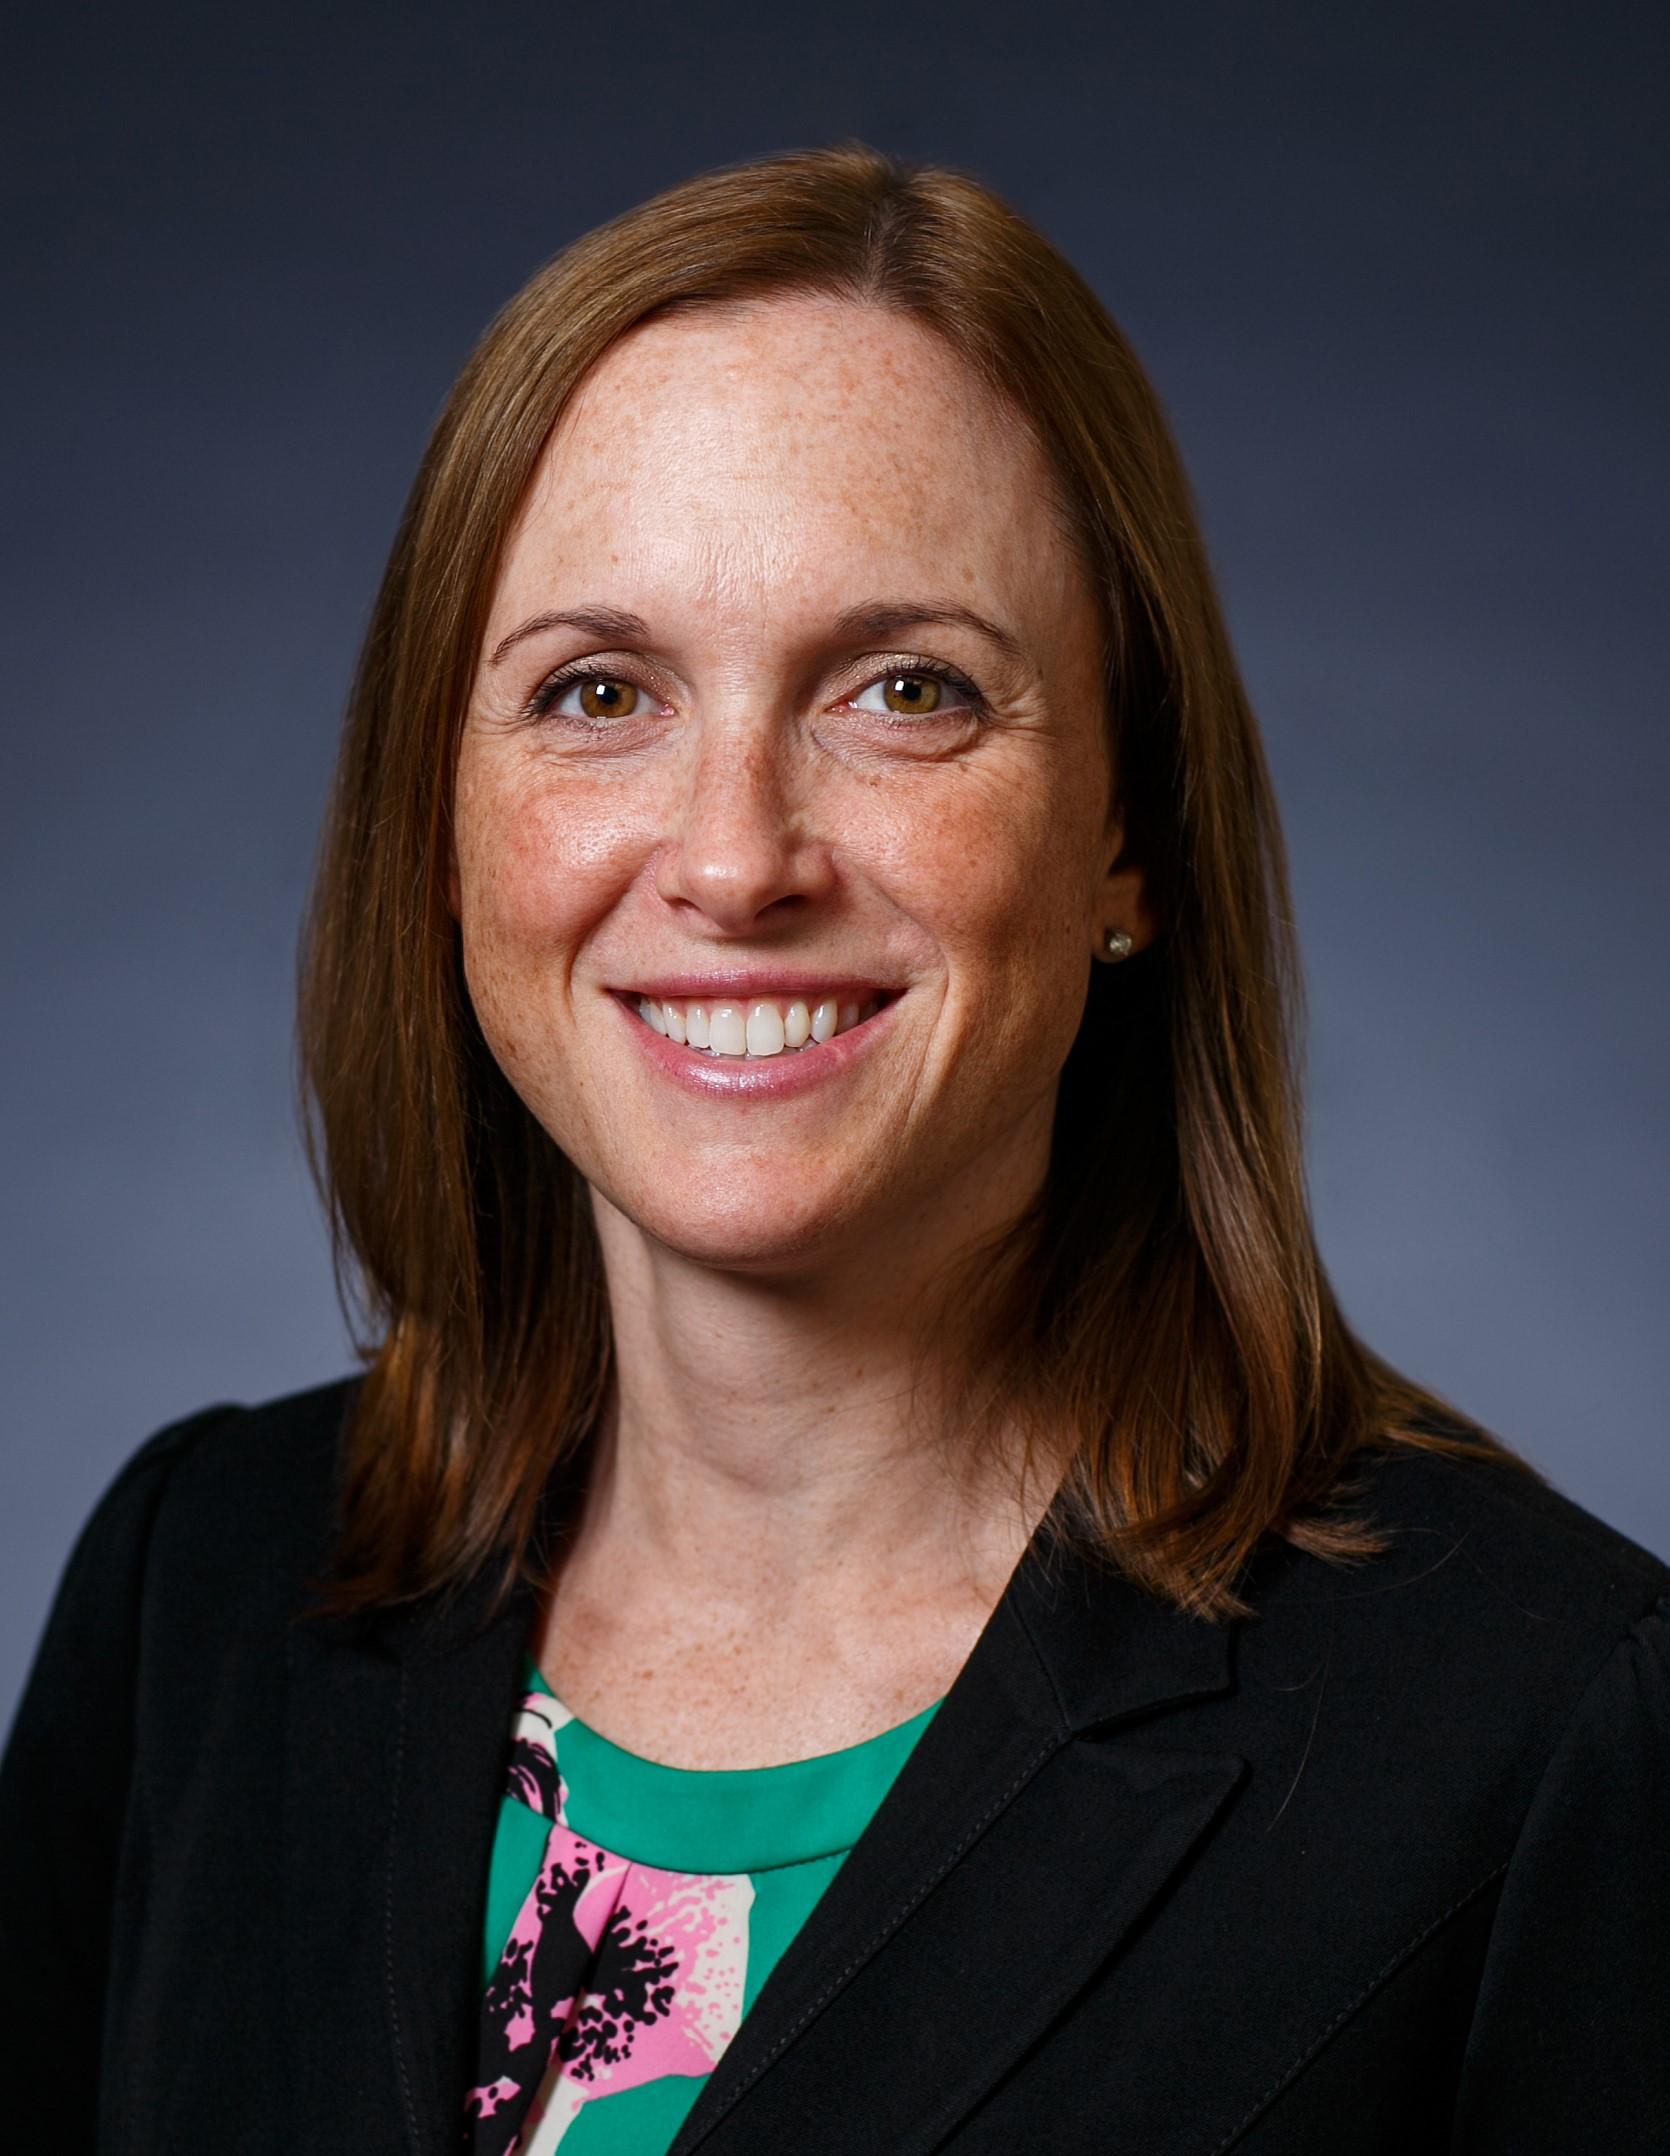 Megan Senkowski, CPA